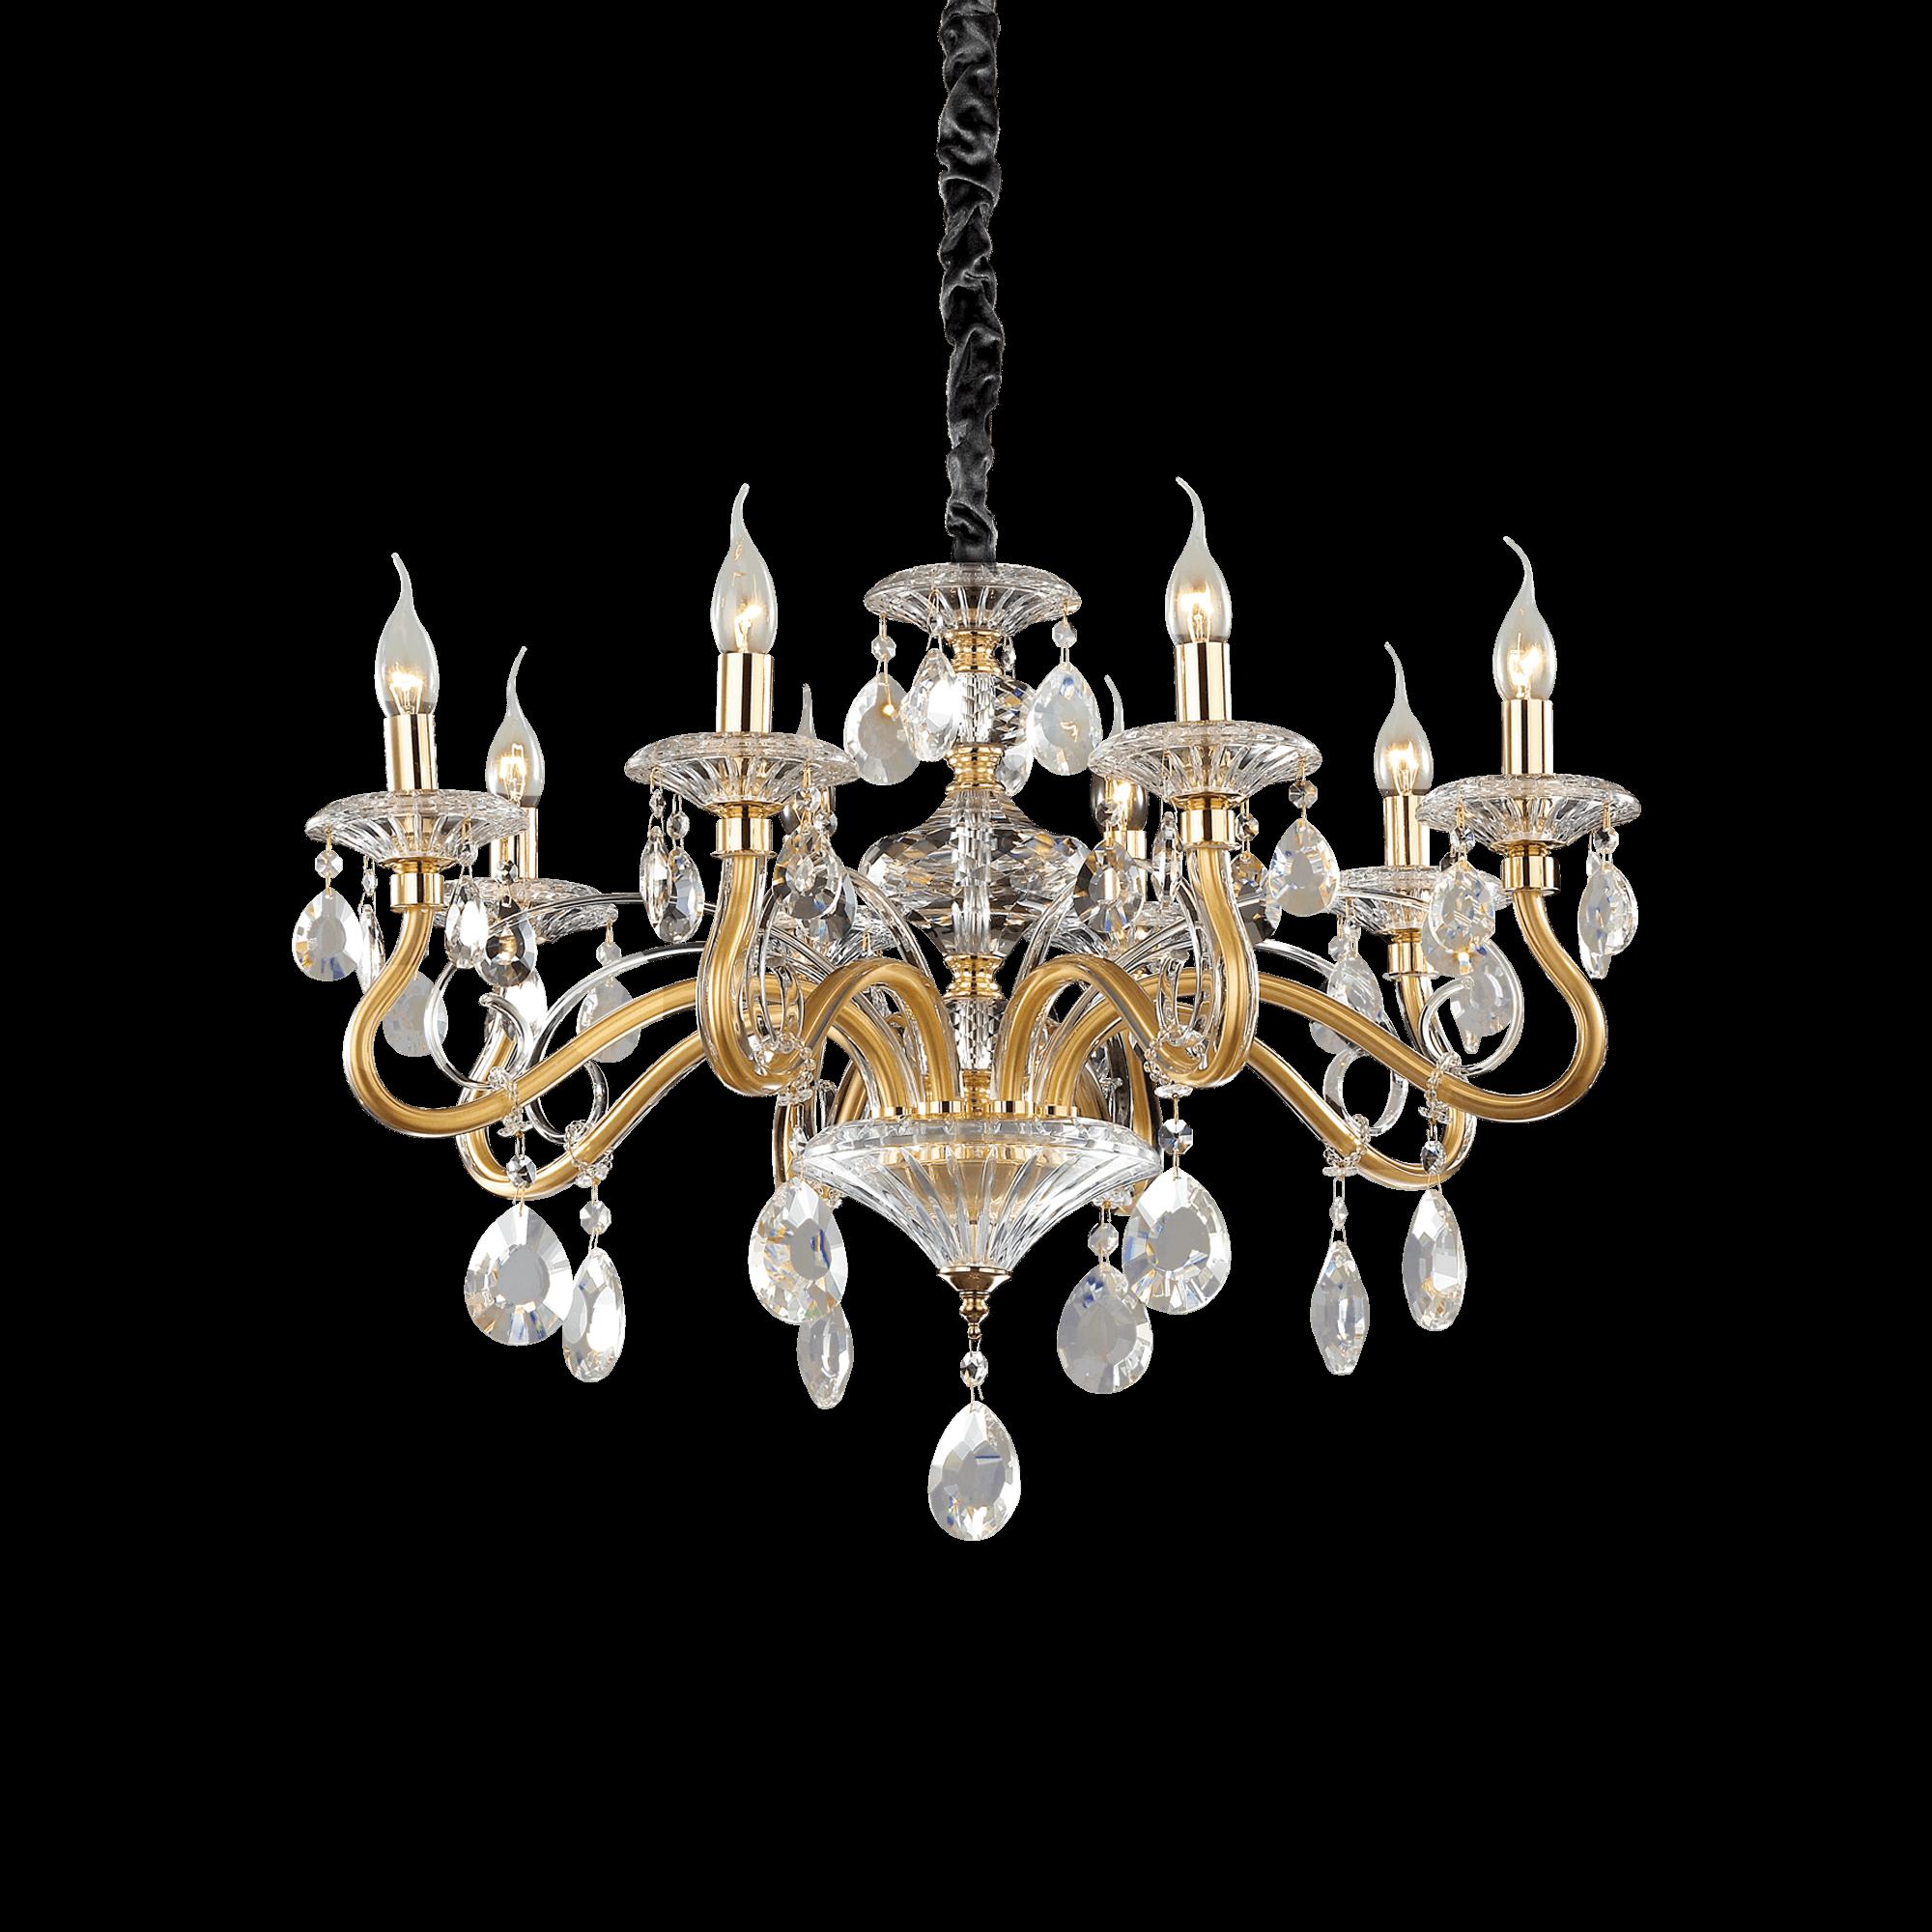 Ideal lux 087764 Negresco SP8 Oro csillár lámpa